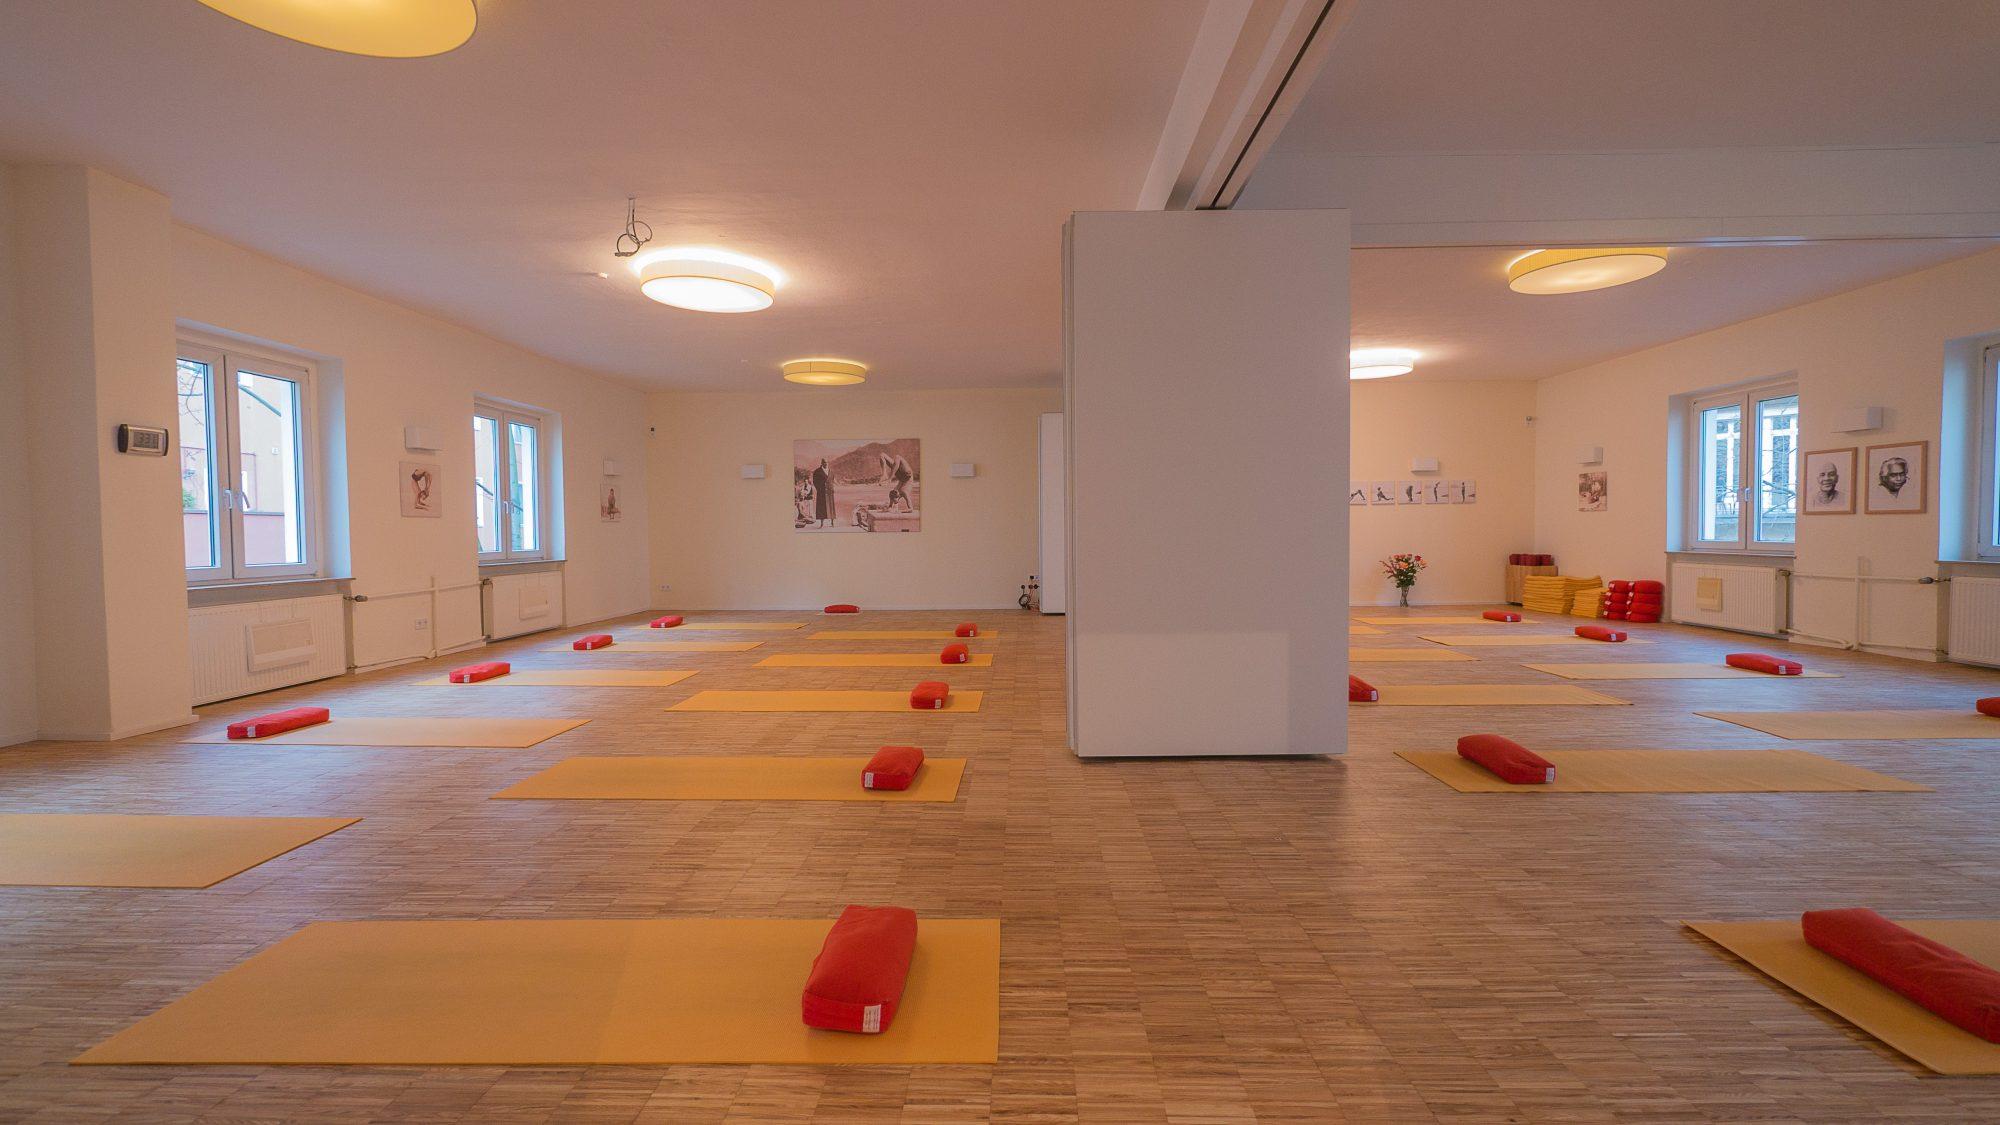 "<div style=""font-family: catamaran; color:#ffffff"">Sivananda Yoga Vedanta Zentrum</br><span style=""font-size: .8em"">Berlin | Germany</span></div>"